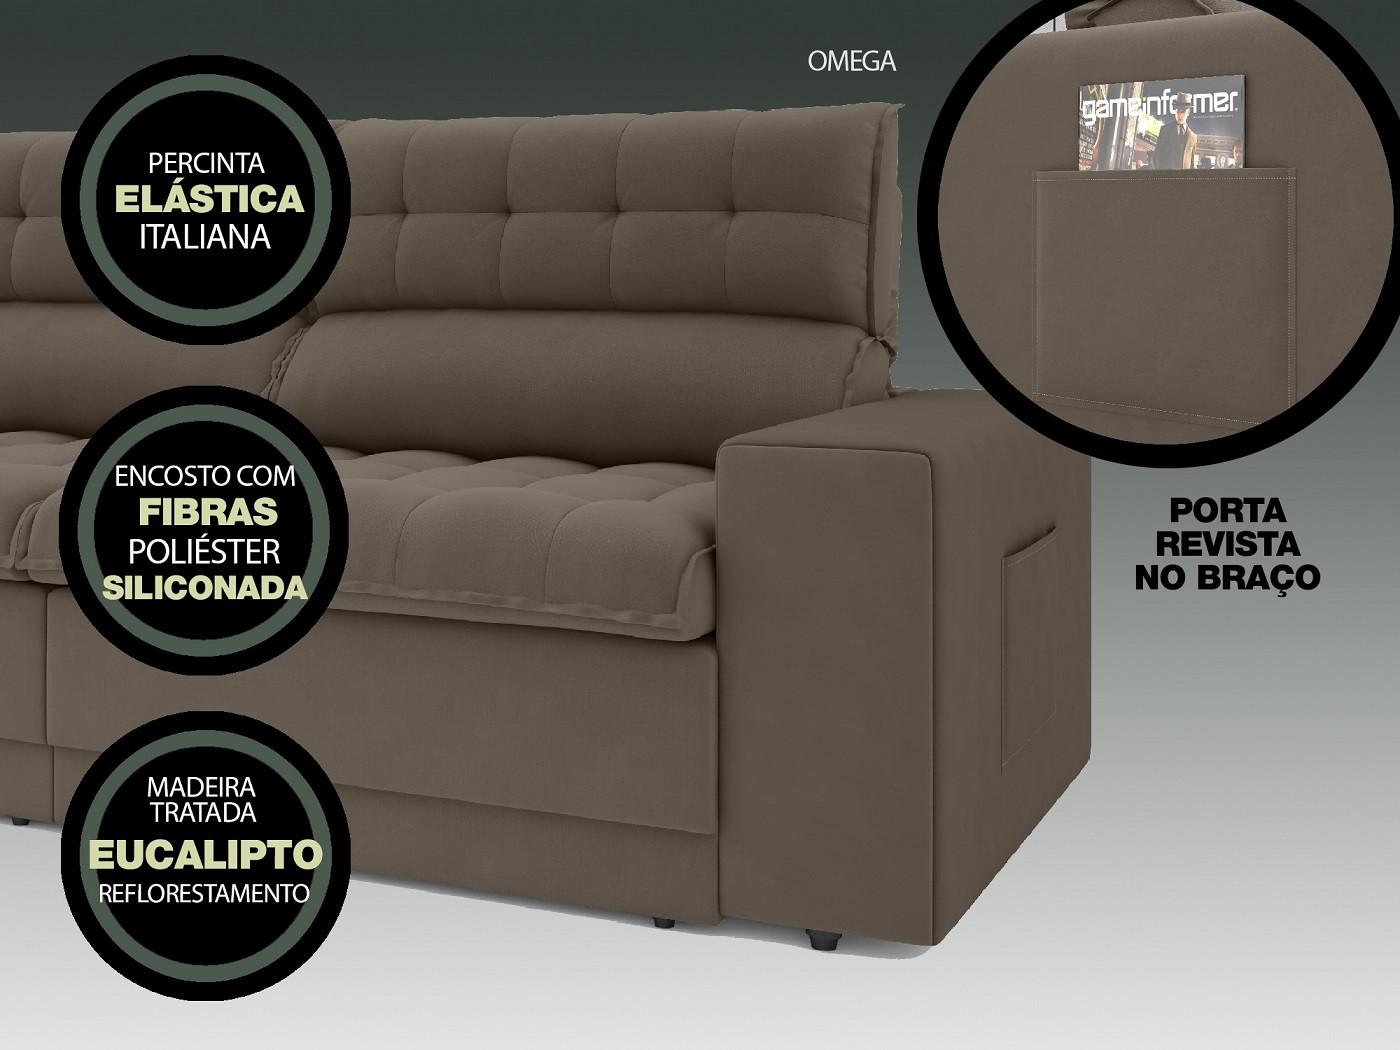 Sofá Omega 2,50m Assento Retrátil e Reclinável Velosuede Marrom - NETSOFAS  - NETSOFÁS